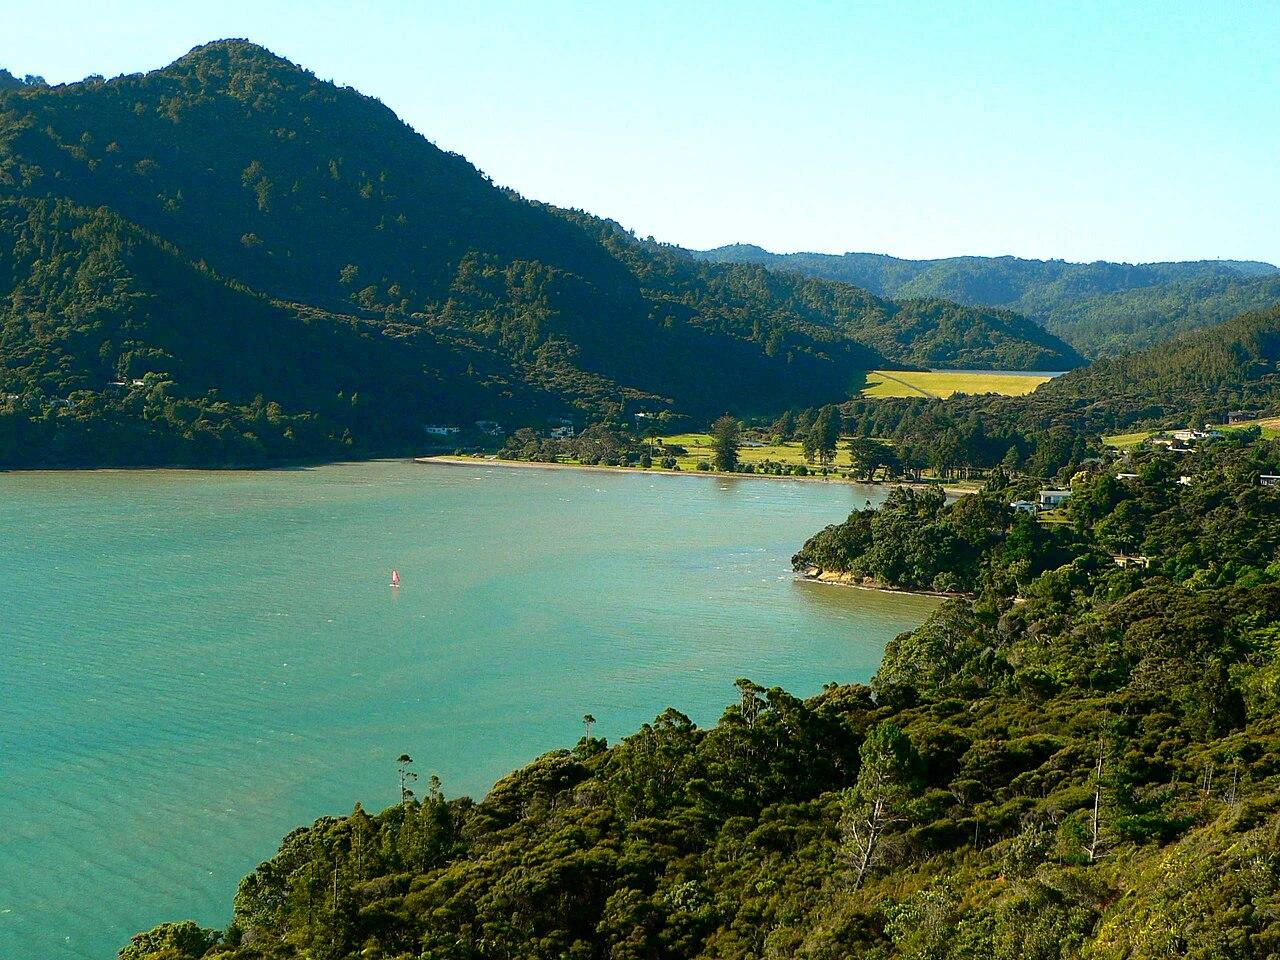 New Zealand Wikipedia: File:Huia, Waitakere City, Auckland, New Zealand.jpg